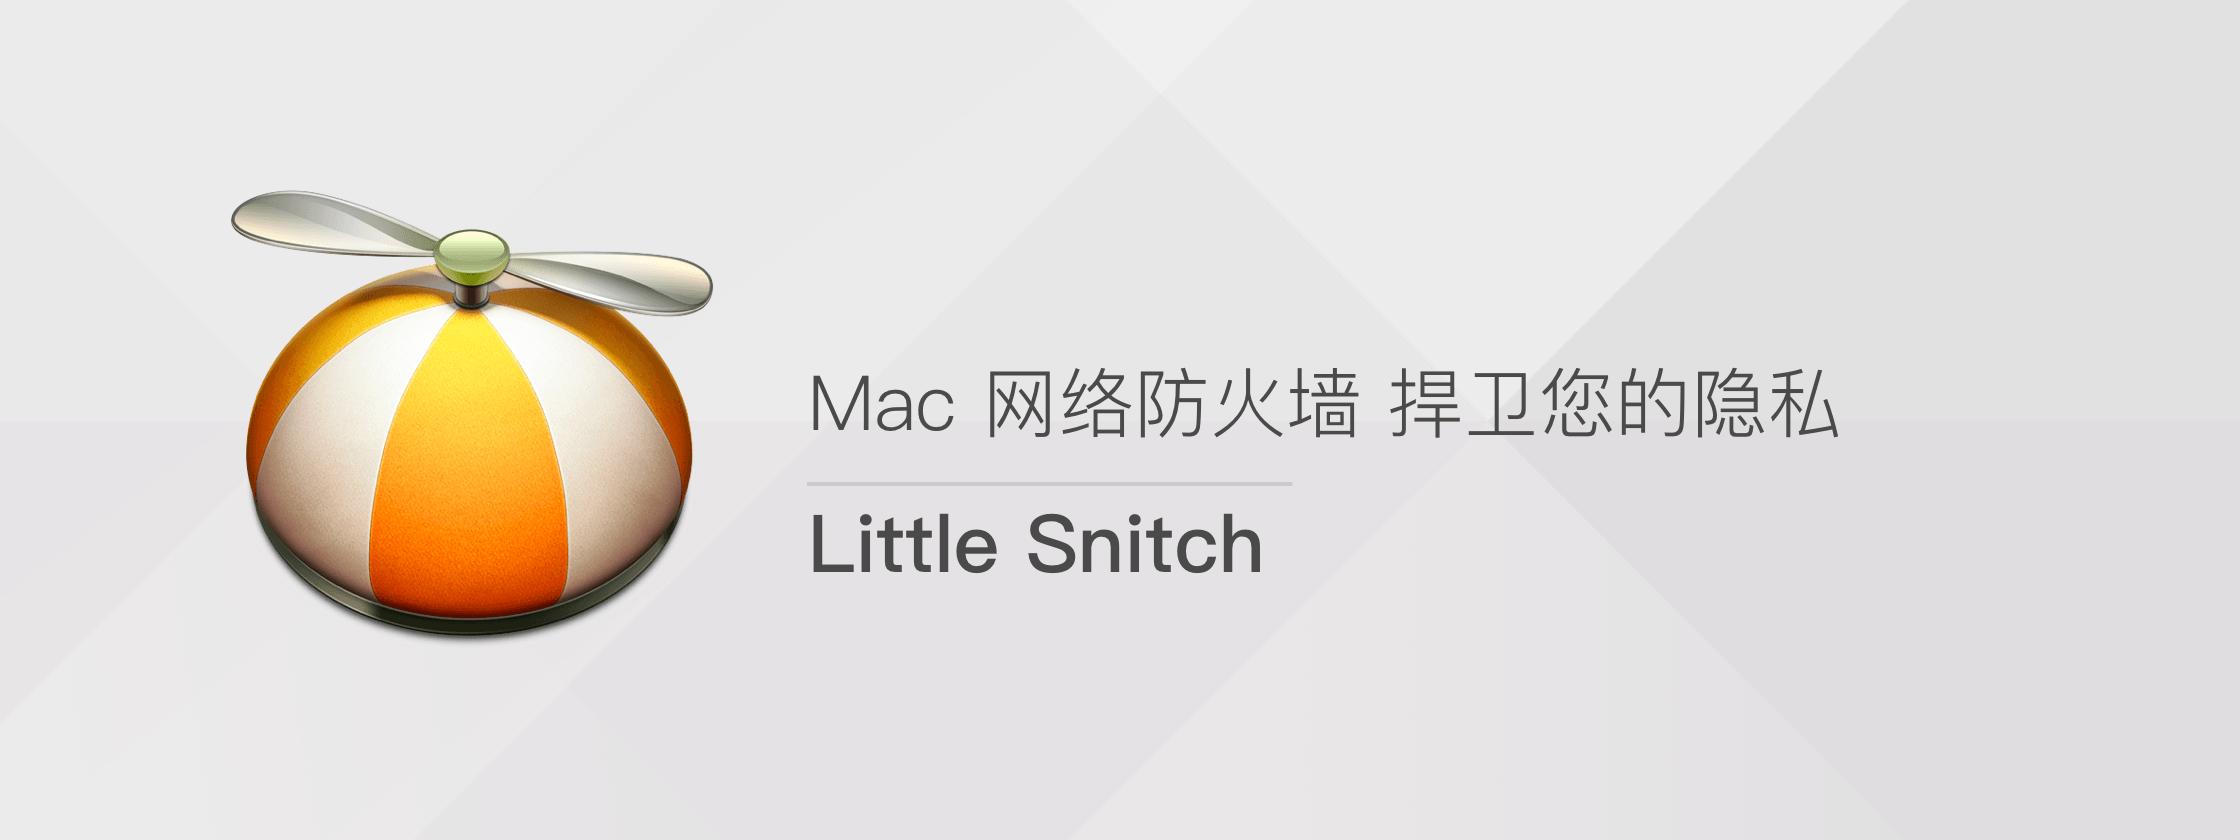 Little Snitch –  Mac 网络防火墙  捍卫您的隐私